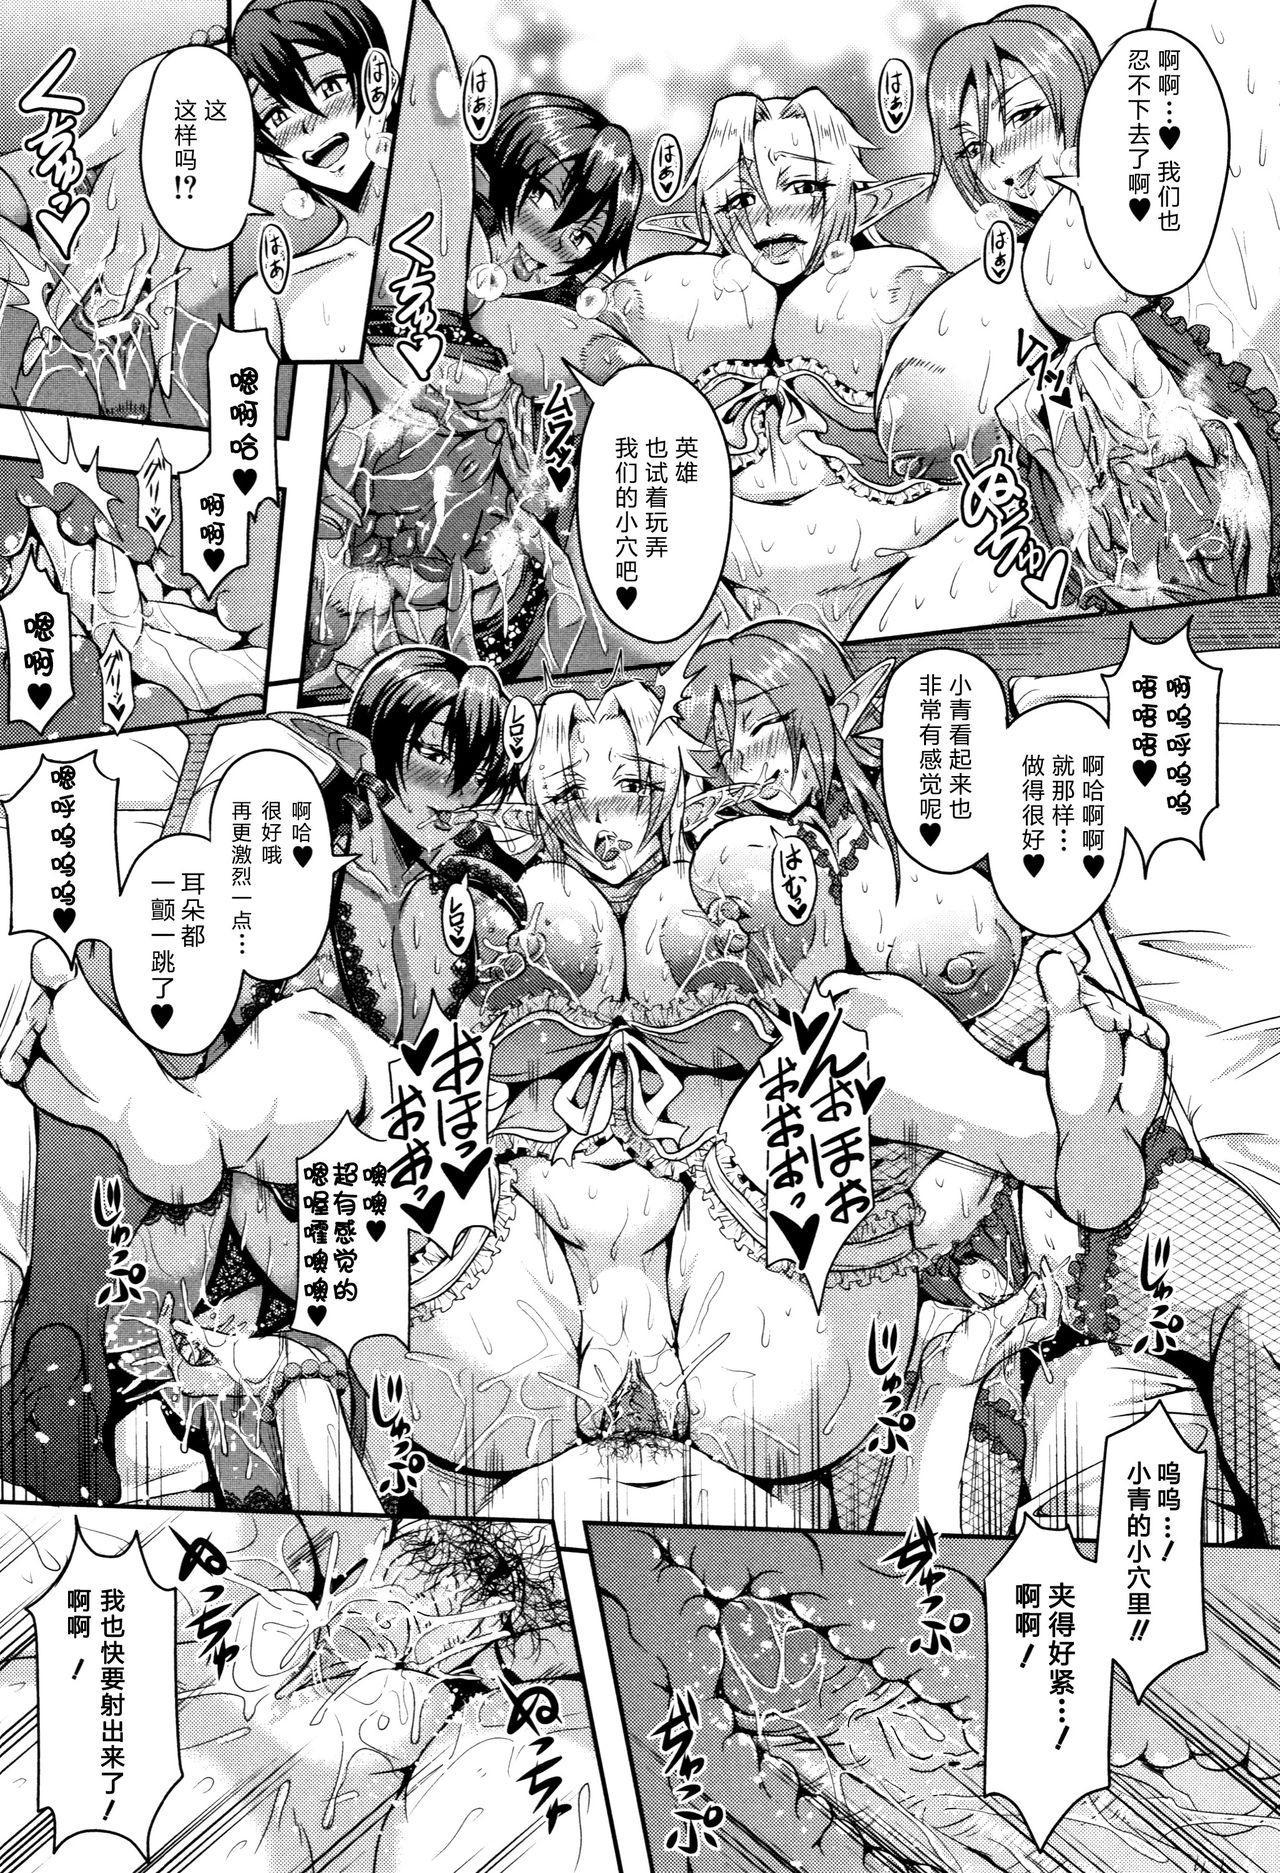 Elf Harem no Mori to Kozukuri Keiyaku | 妖精后宮生子契約 23